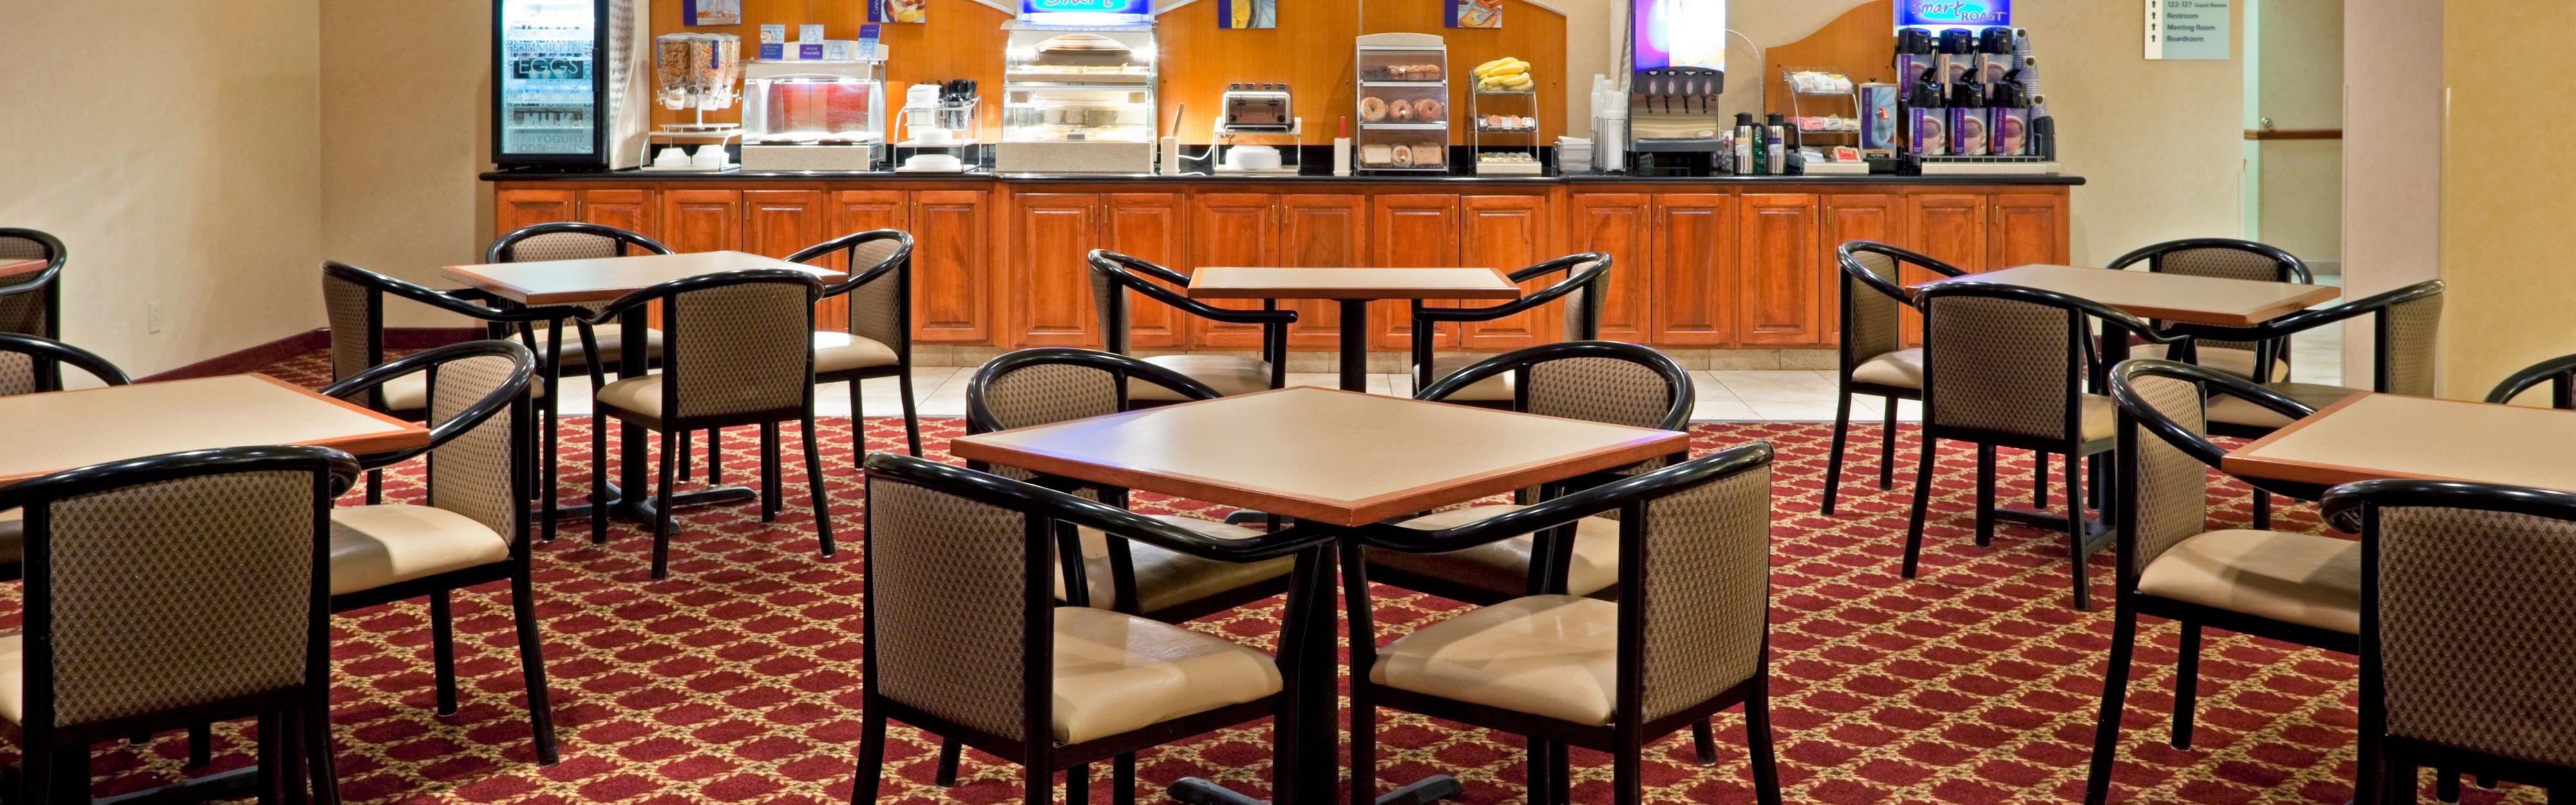 Holiday Inn Express Syracuse-Fairgrounds image 3